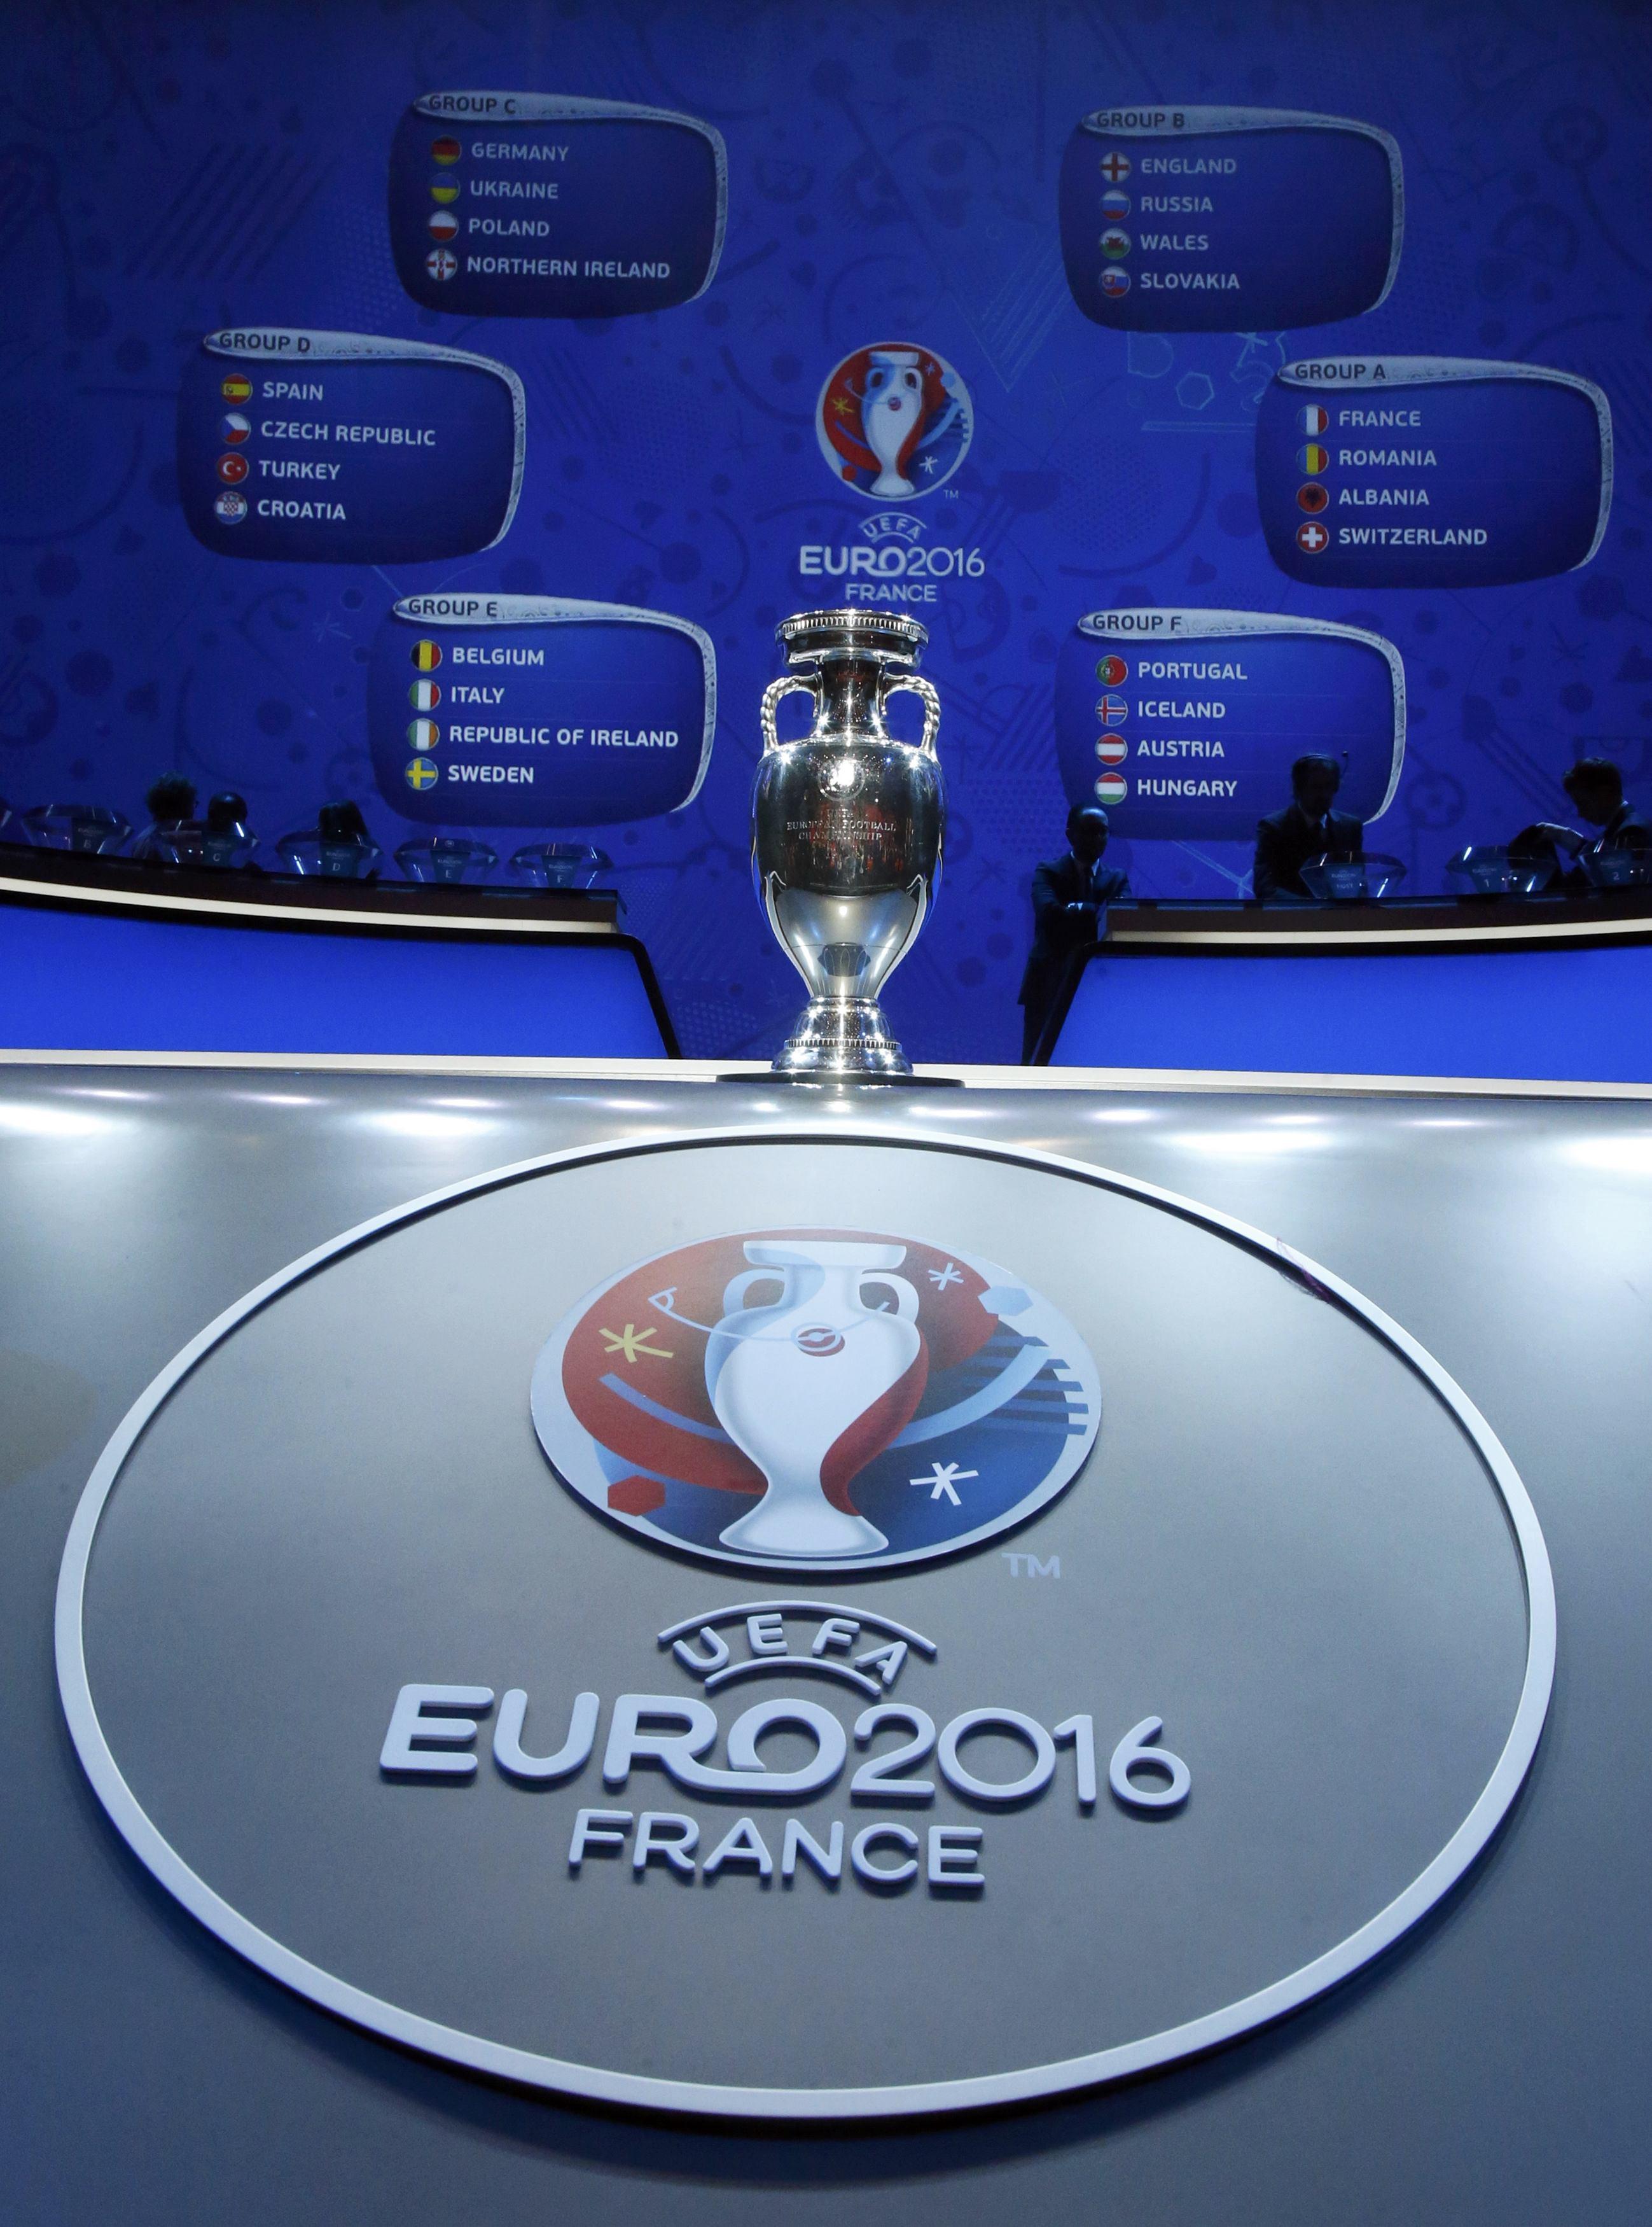 Euro 2016 draw at Palais des Congres in Paris, France on December 12, 2015. Photo: Reuters